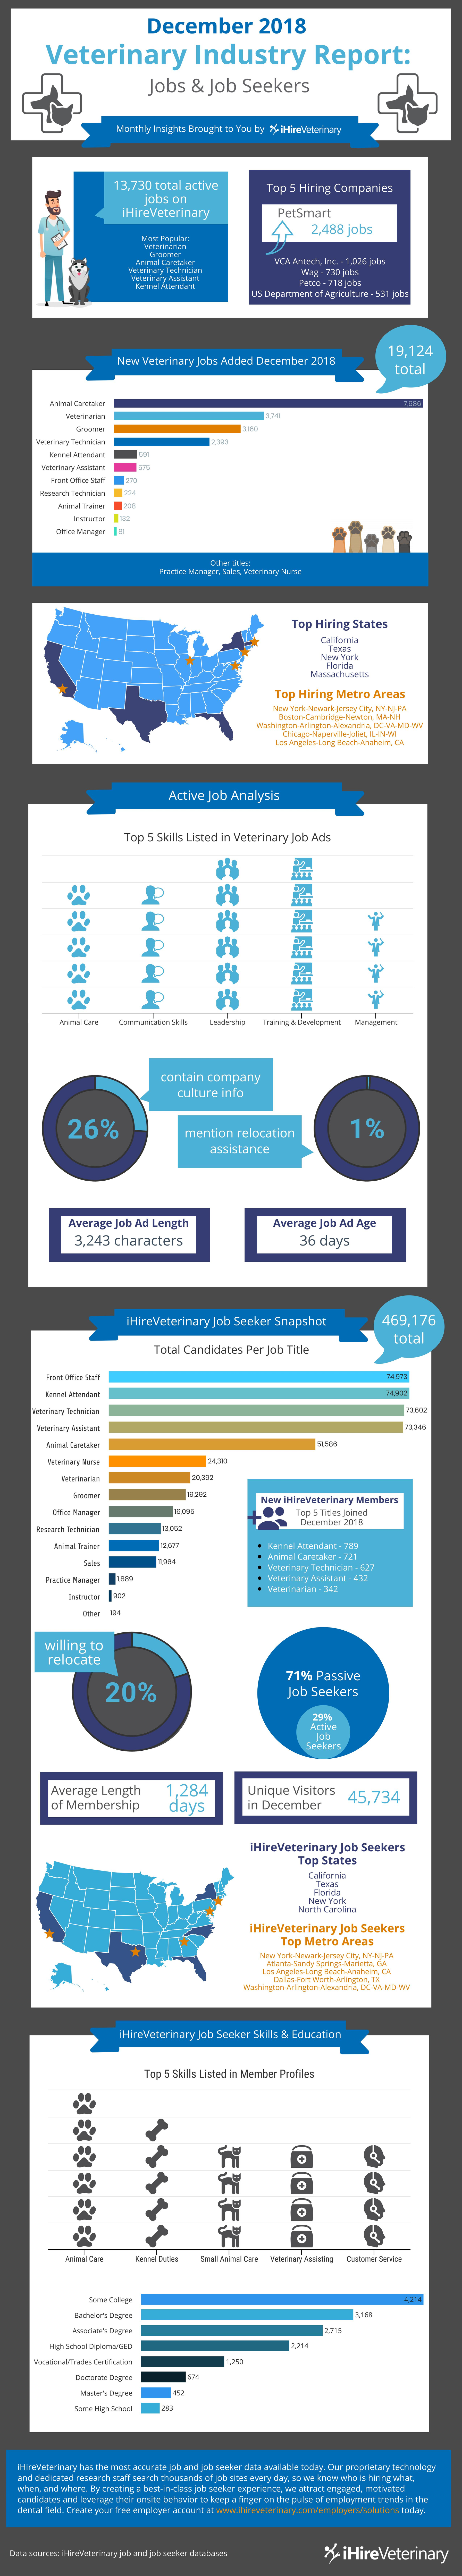 ihireveterinary nov 2018 veterinary industry report infographic